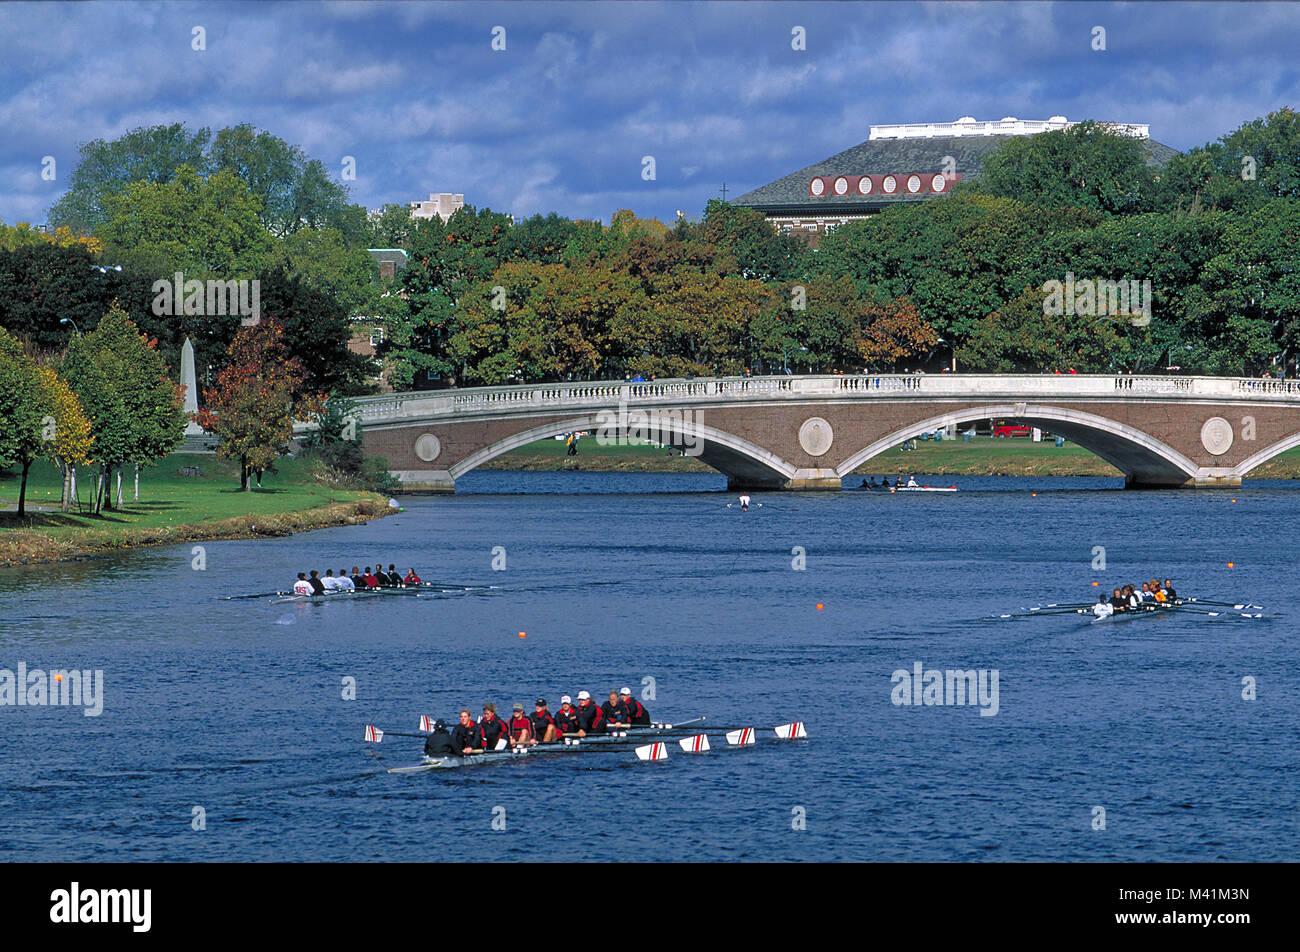 United States, Massachusetts, Harvard university in Cambridge, bridge on the Charles River and training of the students Stock Photo